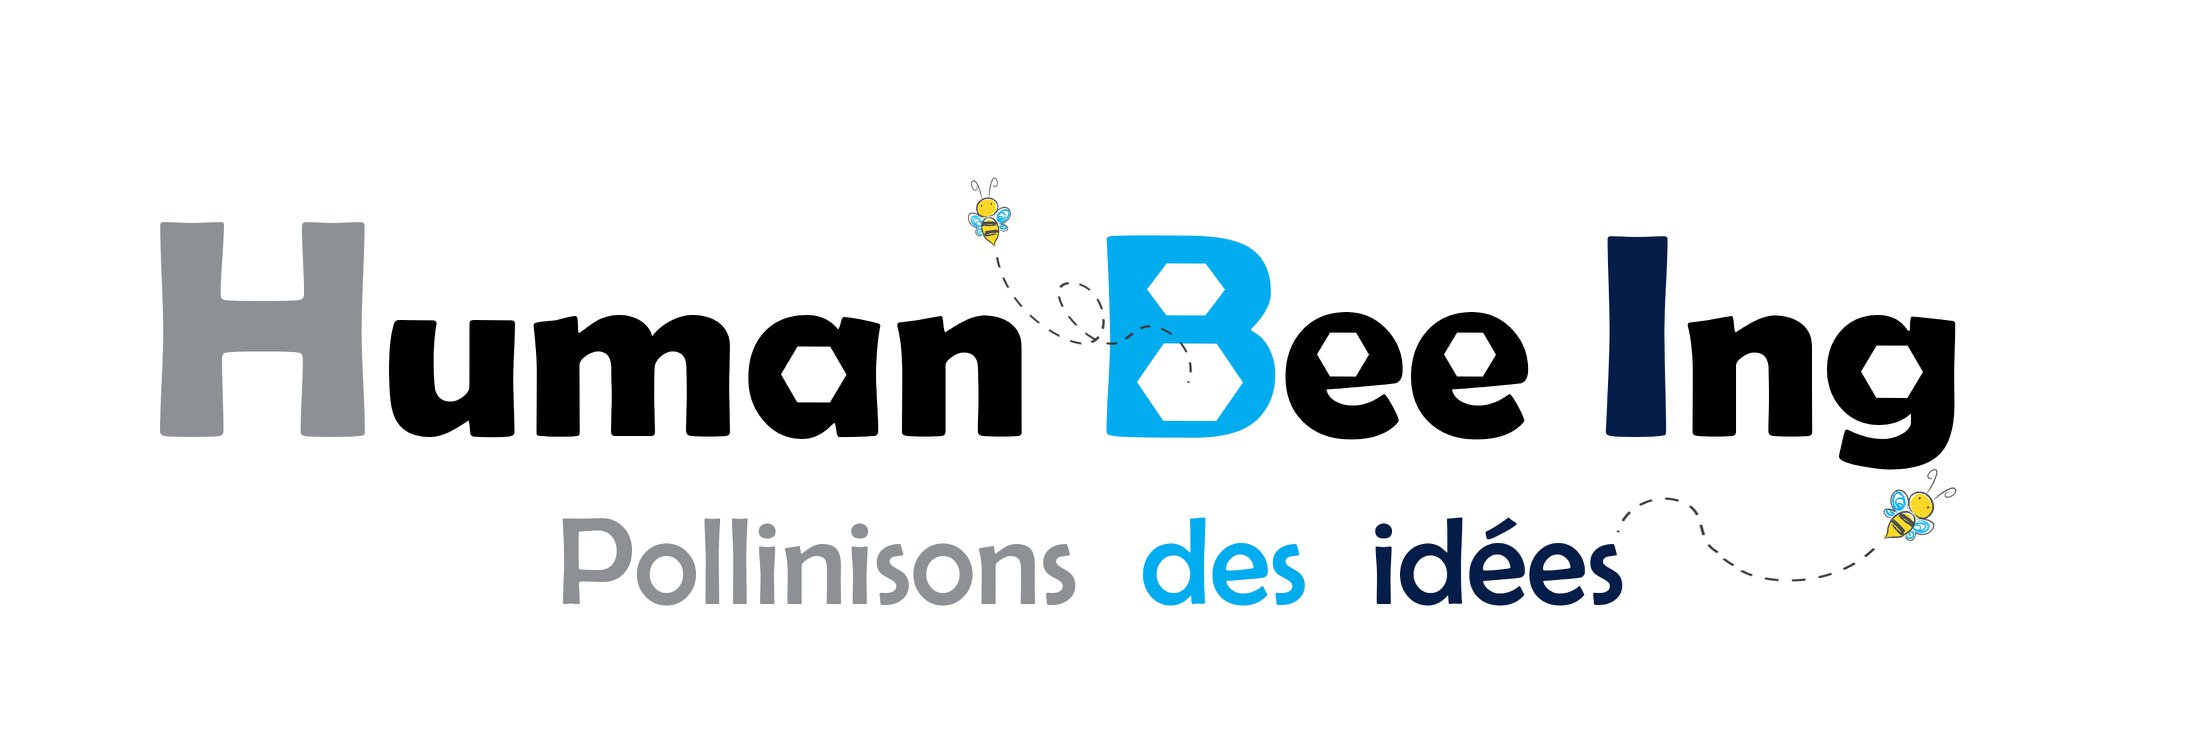 Human Bee Ing